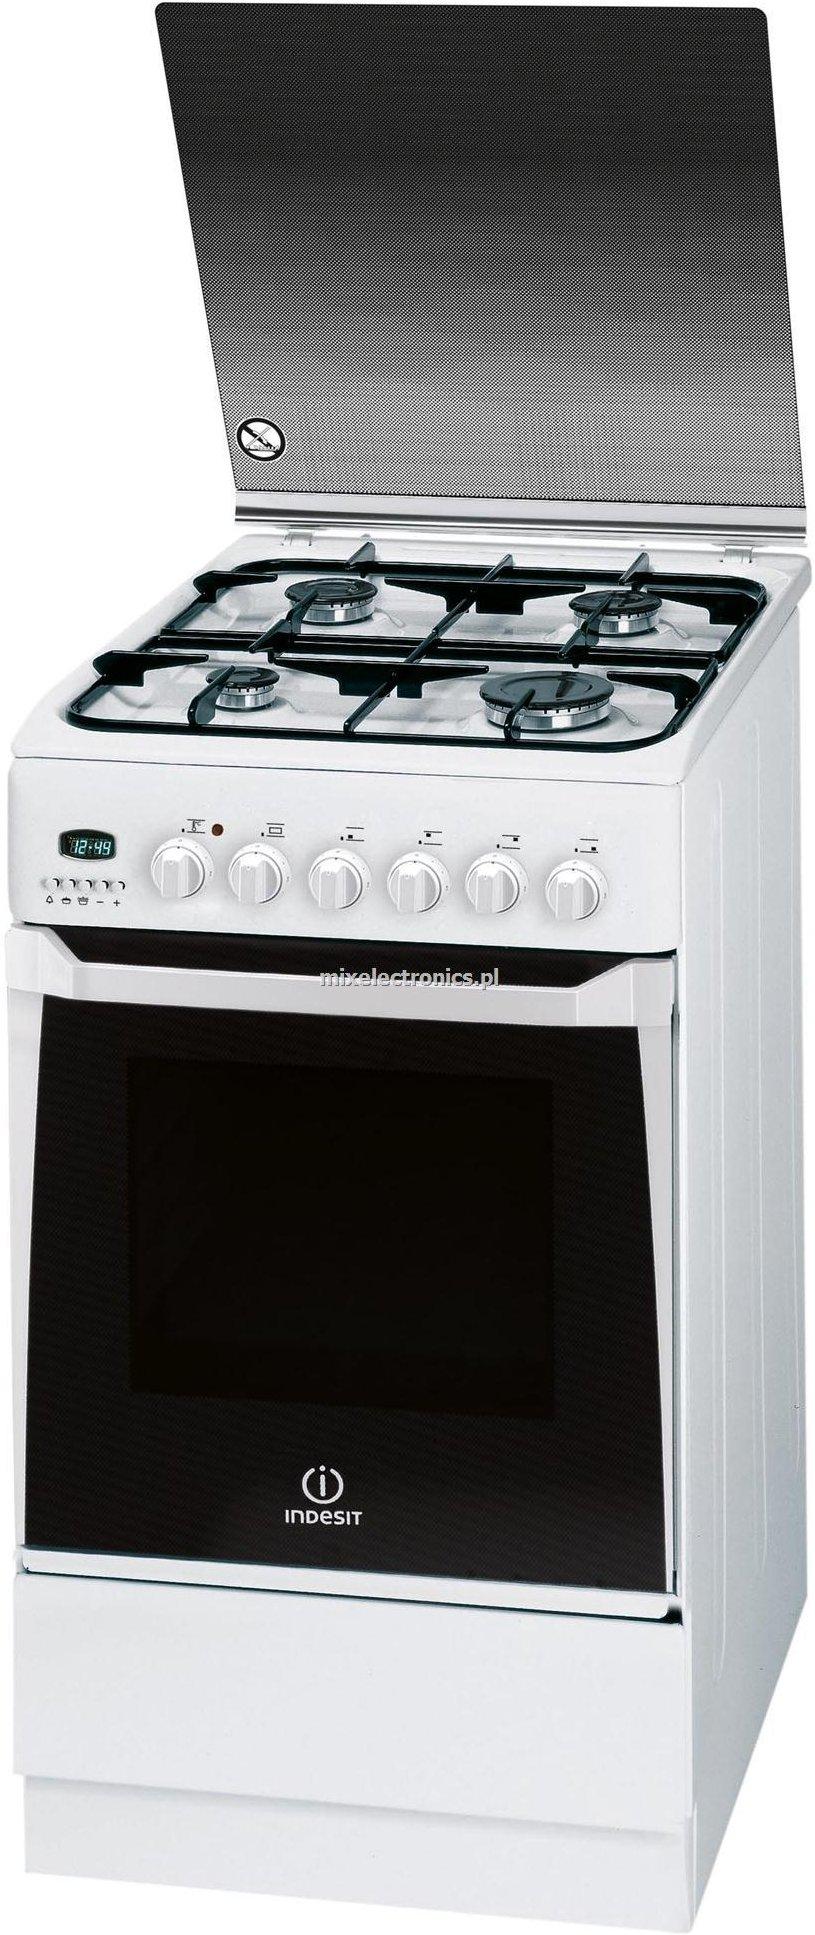 Indesit Kn3 G650 Sa W U Kuchnia Gazowa Rtvagd Sklep Internetowy